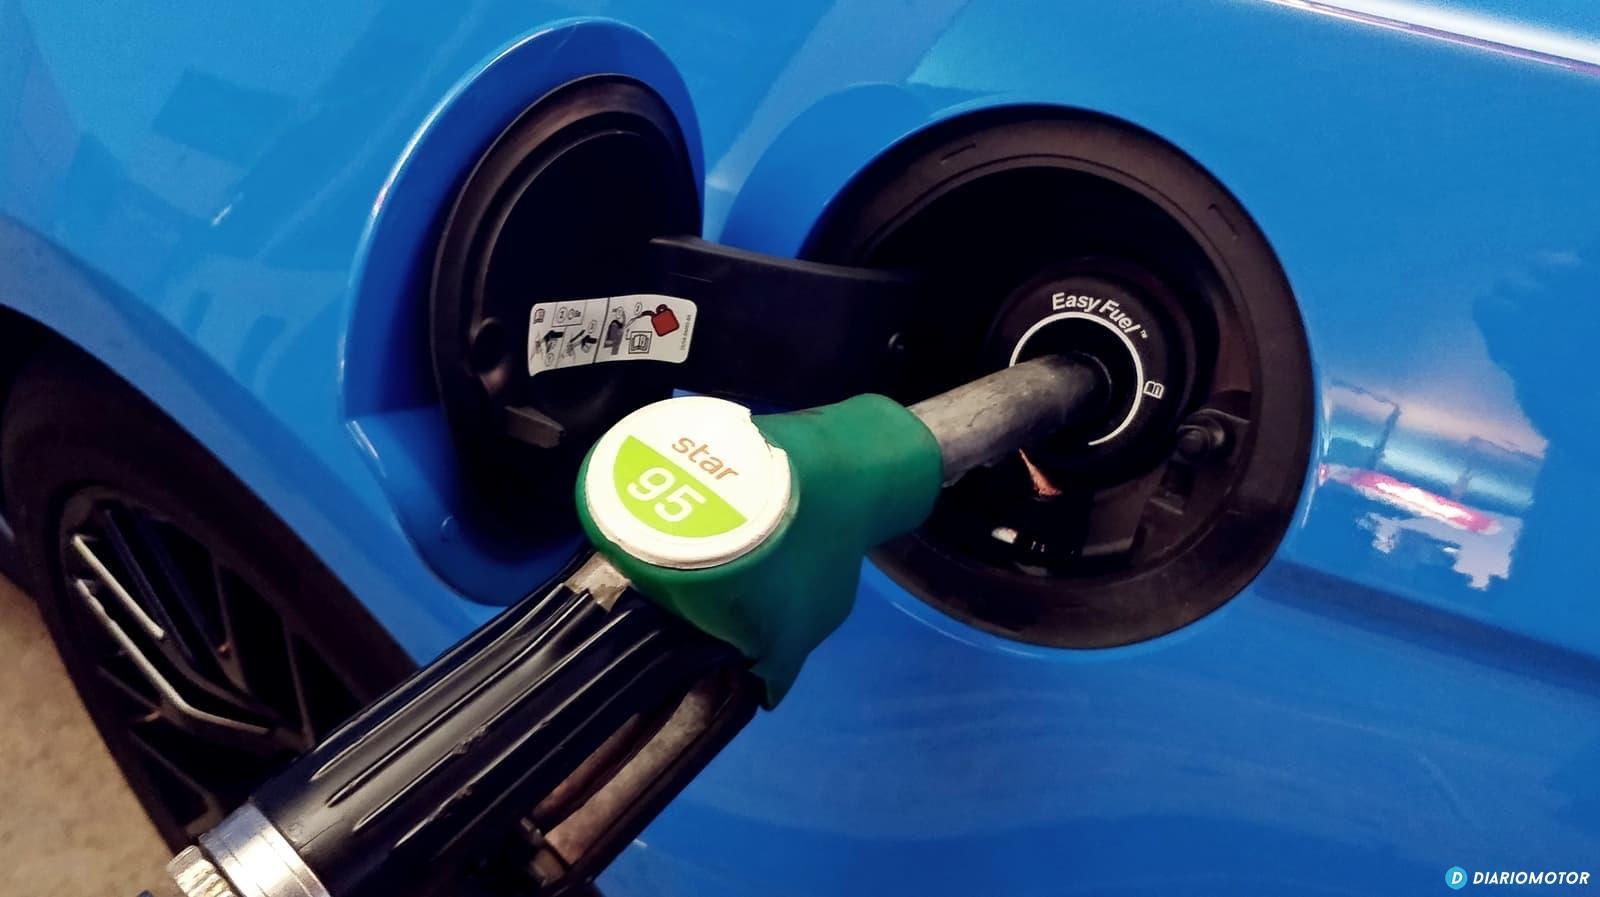 Gasolina Surtidor Repostaje 0119 01